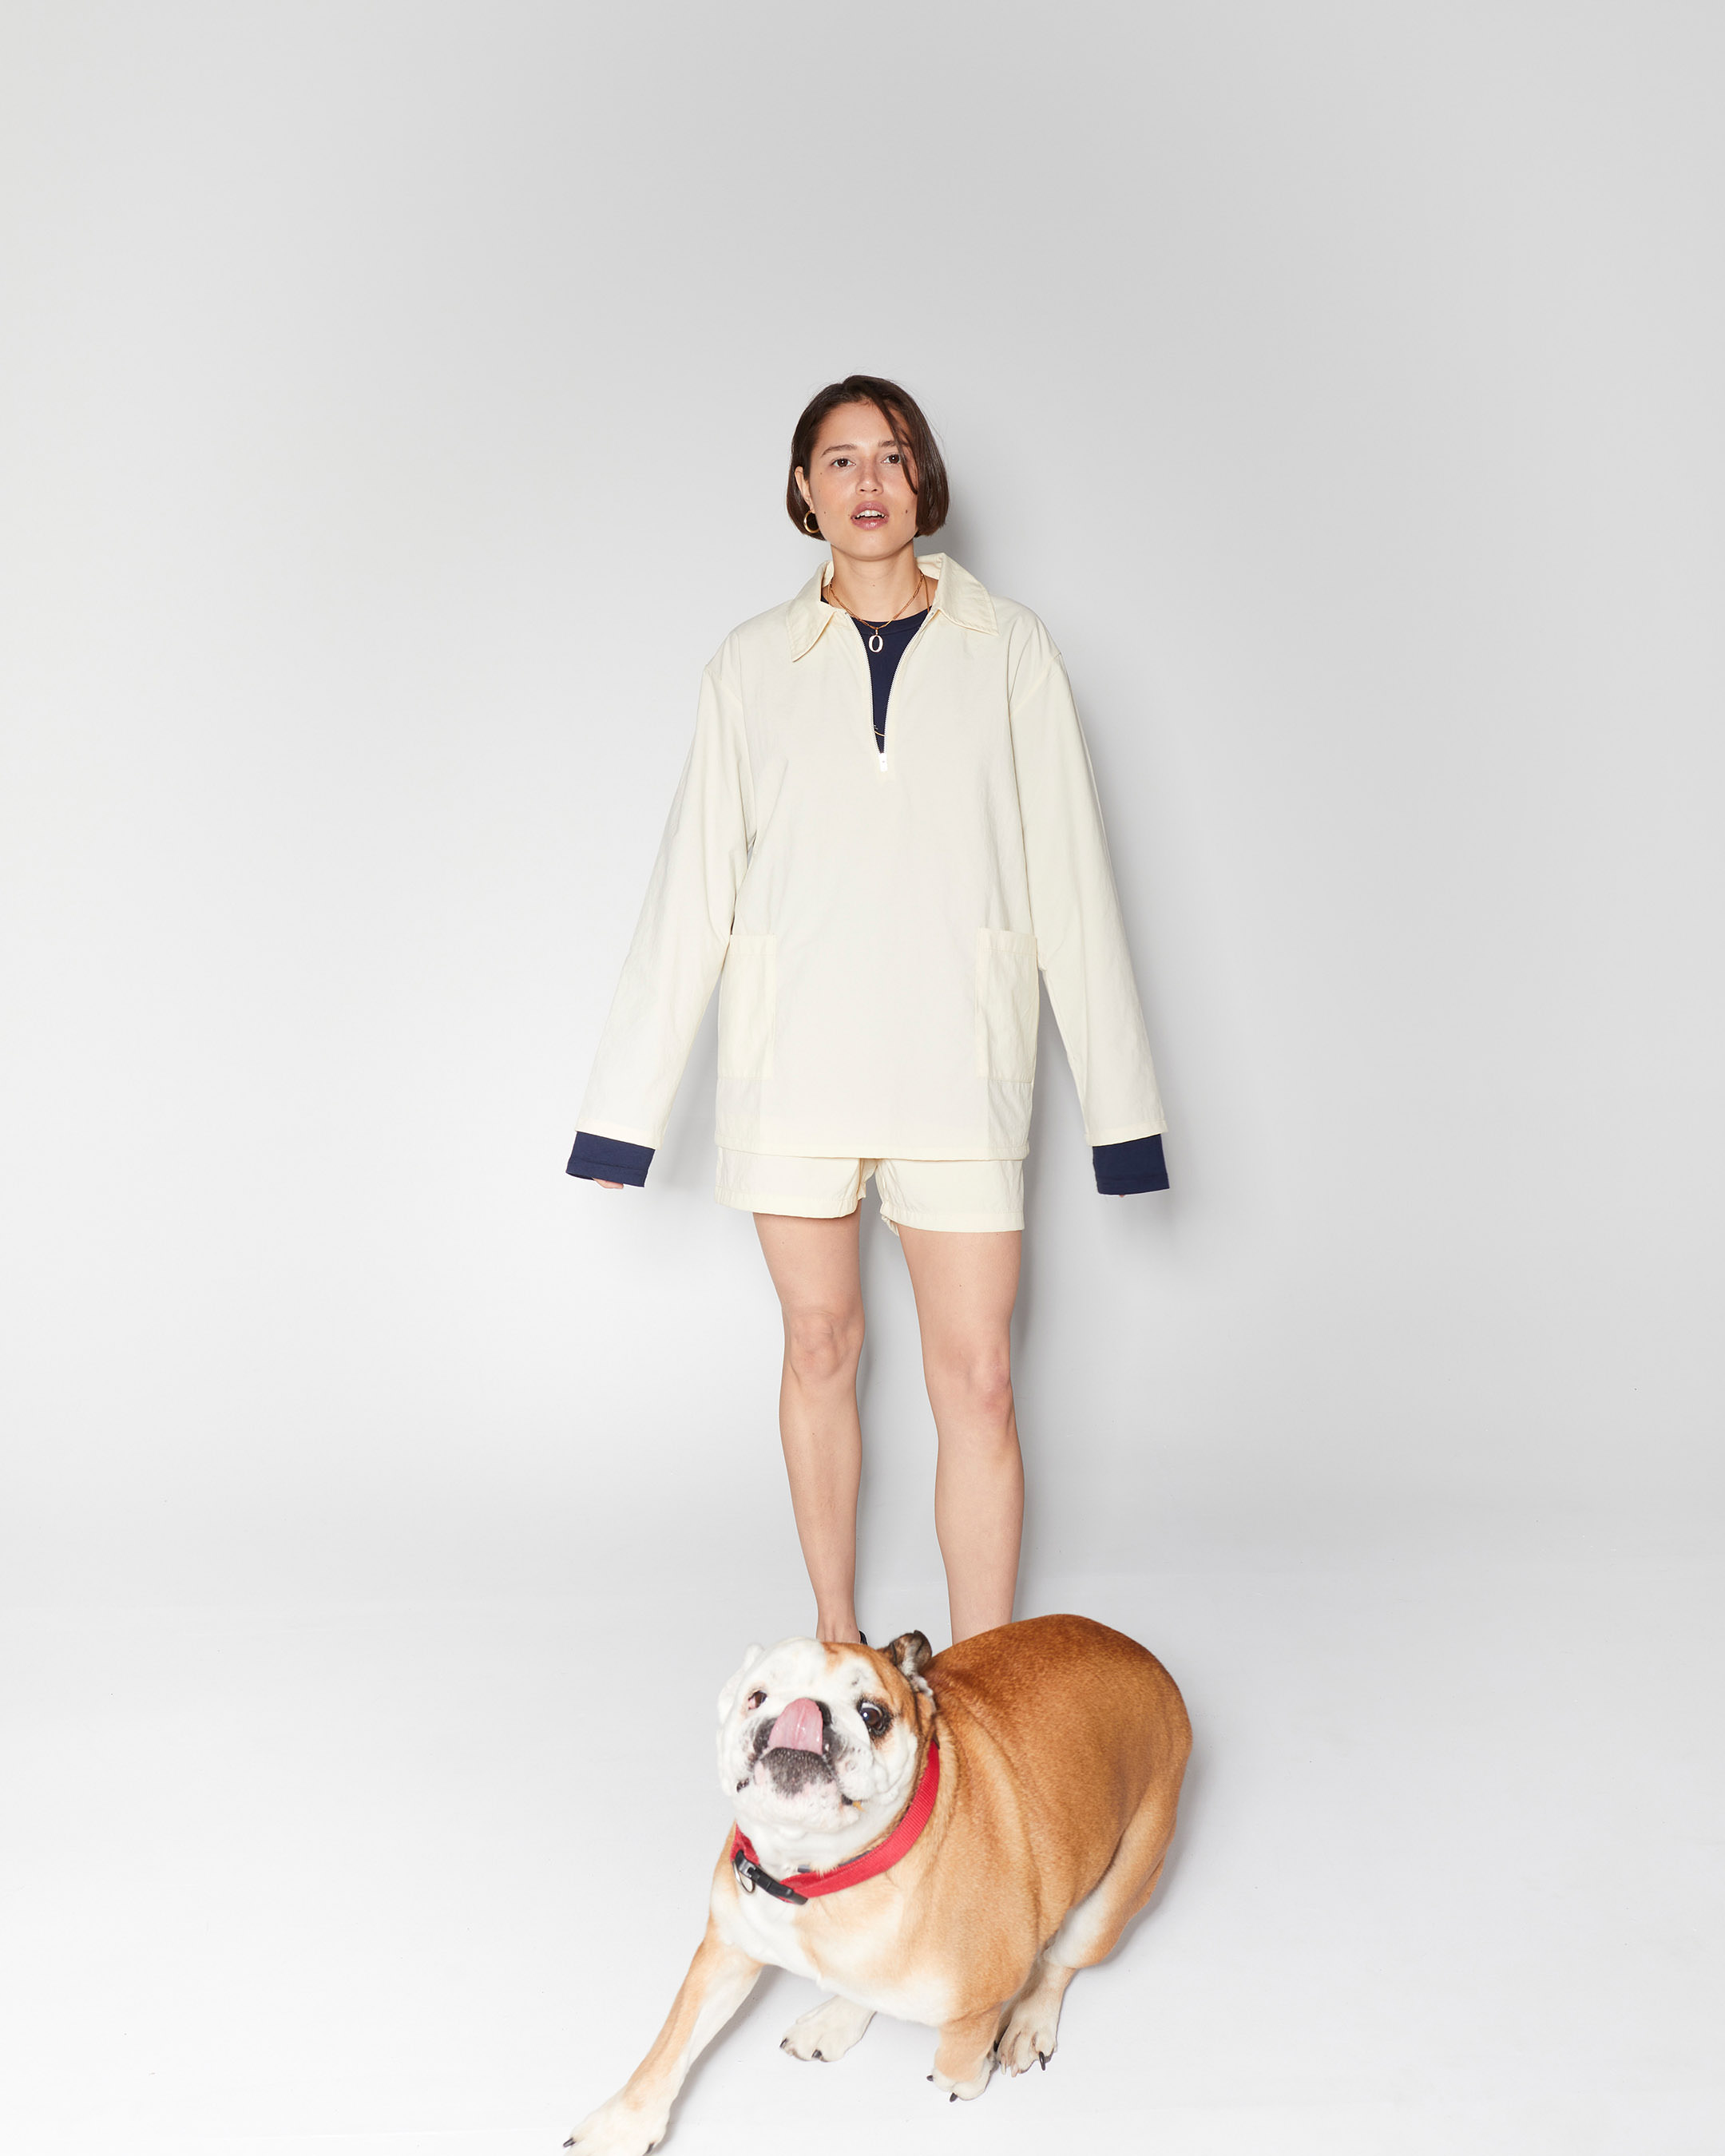 shorts 3  nylon short beige 210415 ecom 835